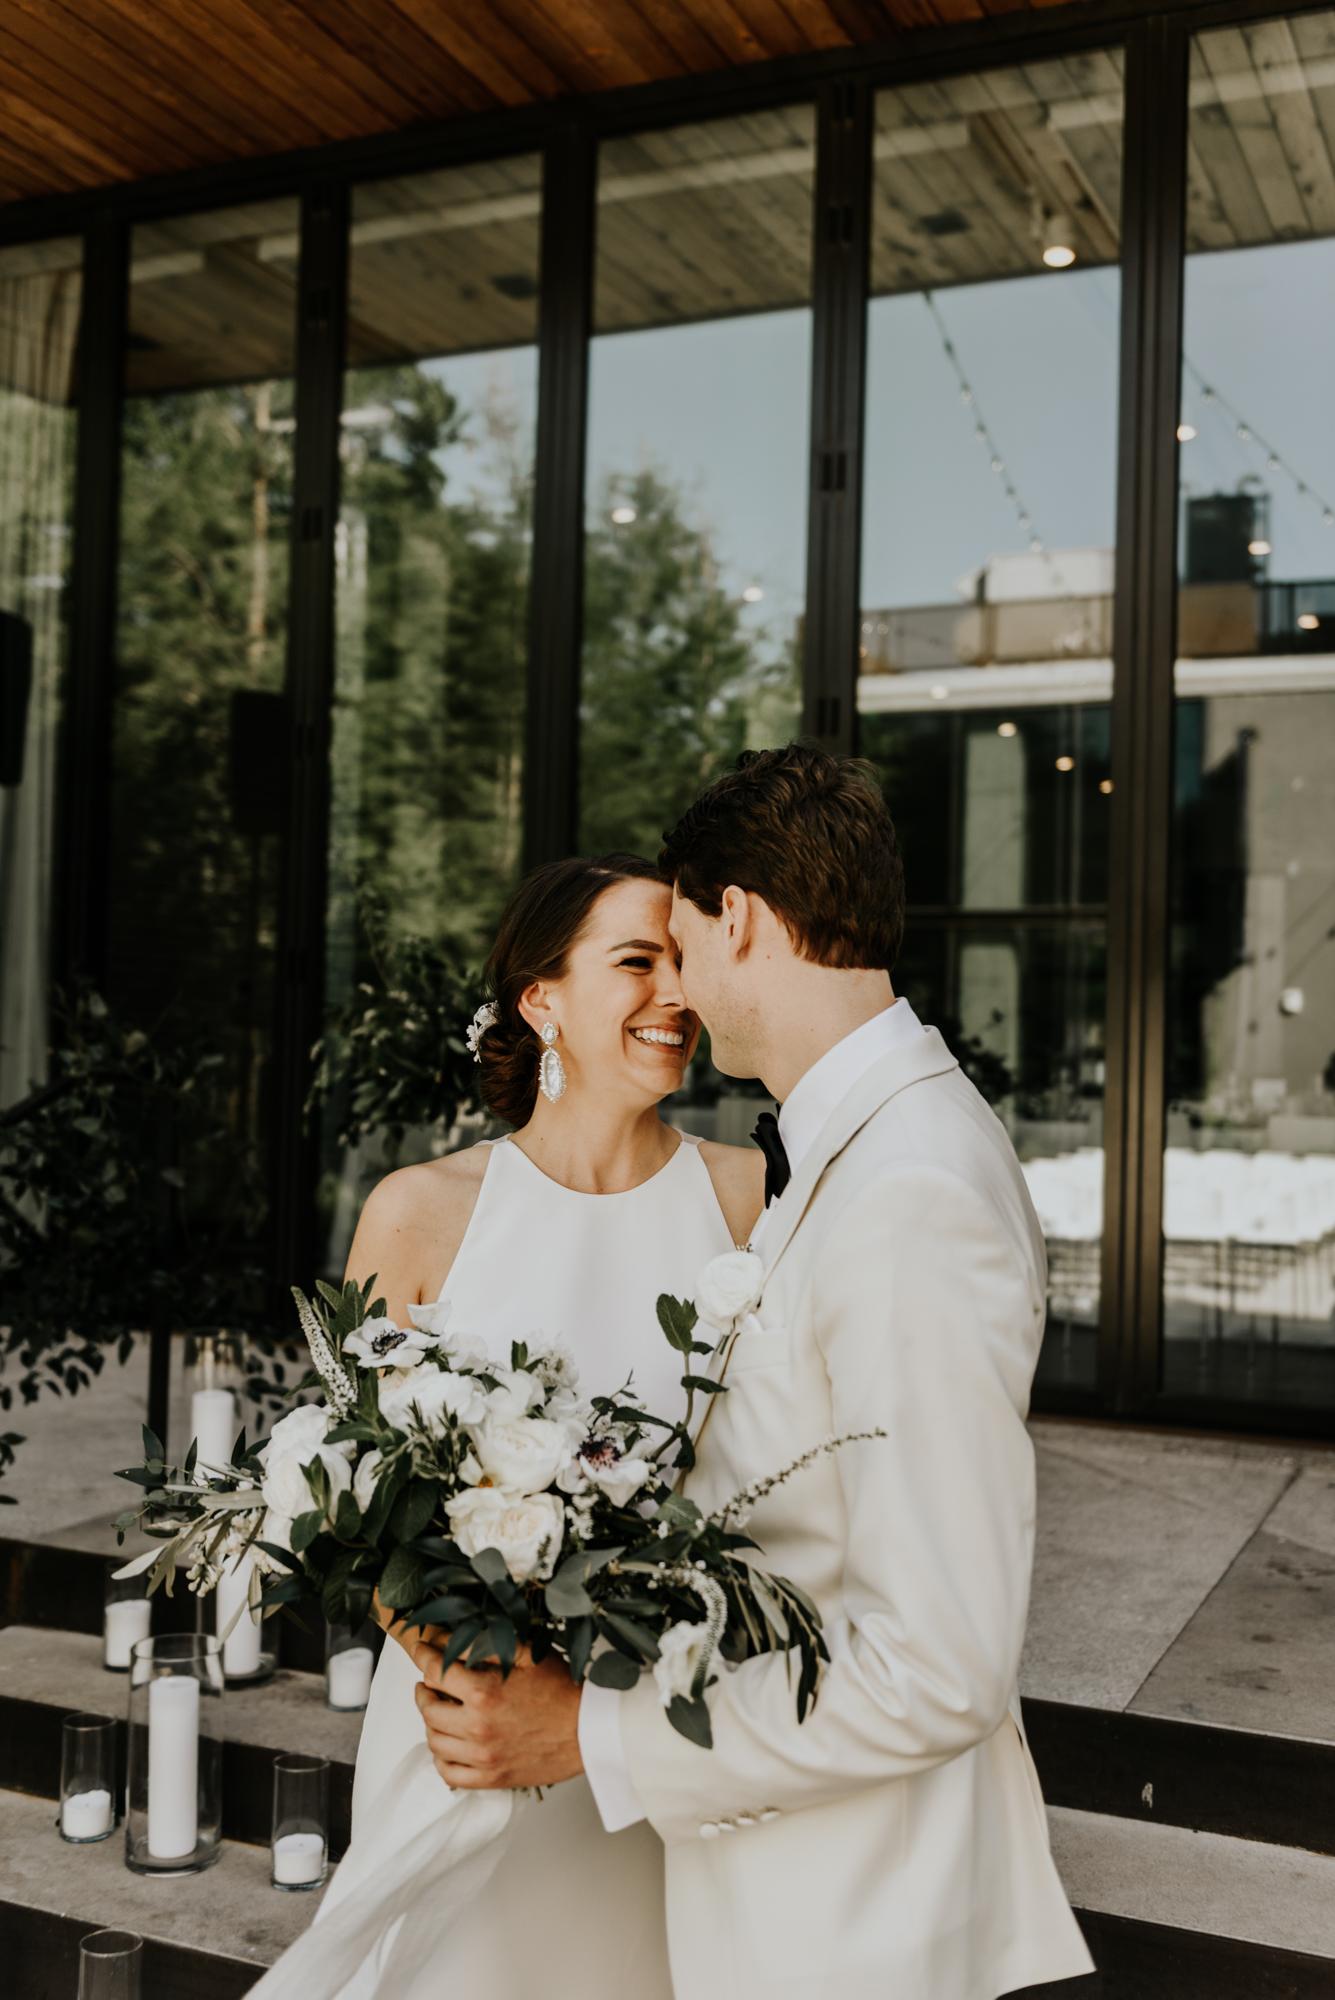 Intimate Wedding Photographer Austin, Texas